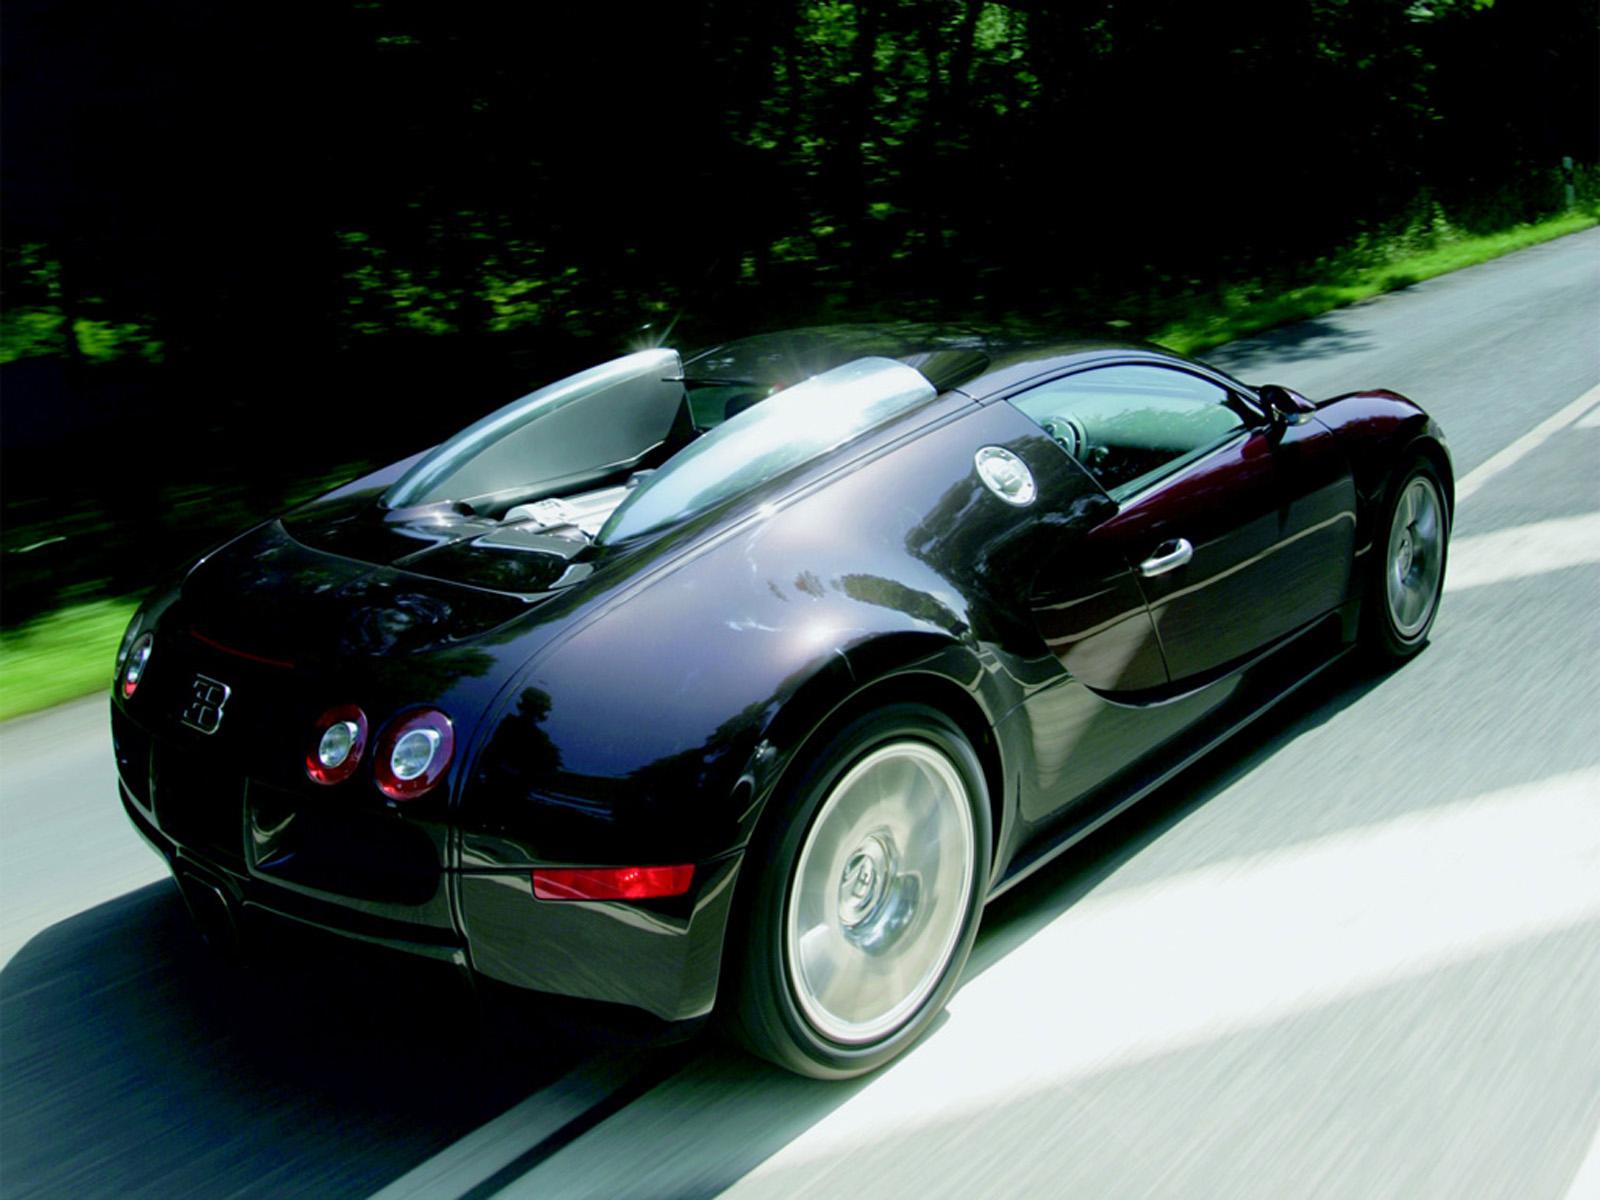 bugatti-veyron-back-view Inspiring Bugatti Veyron Quarter Mile Speed Cars Trend